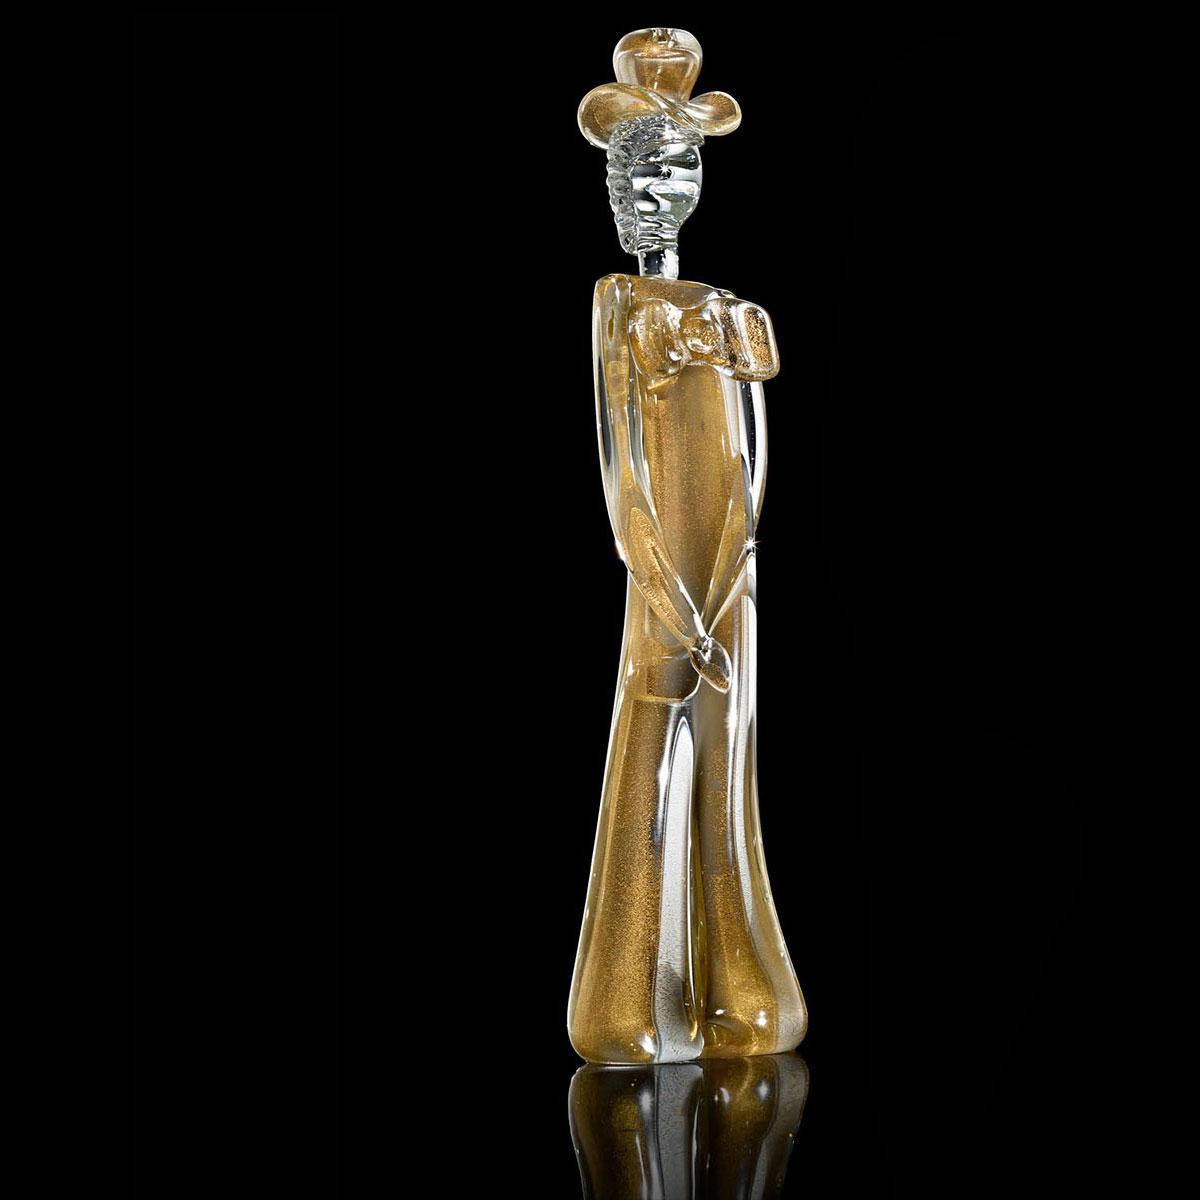 """Cavaliere"" Murano glas Skulptur - gold"